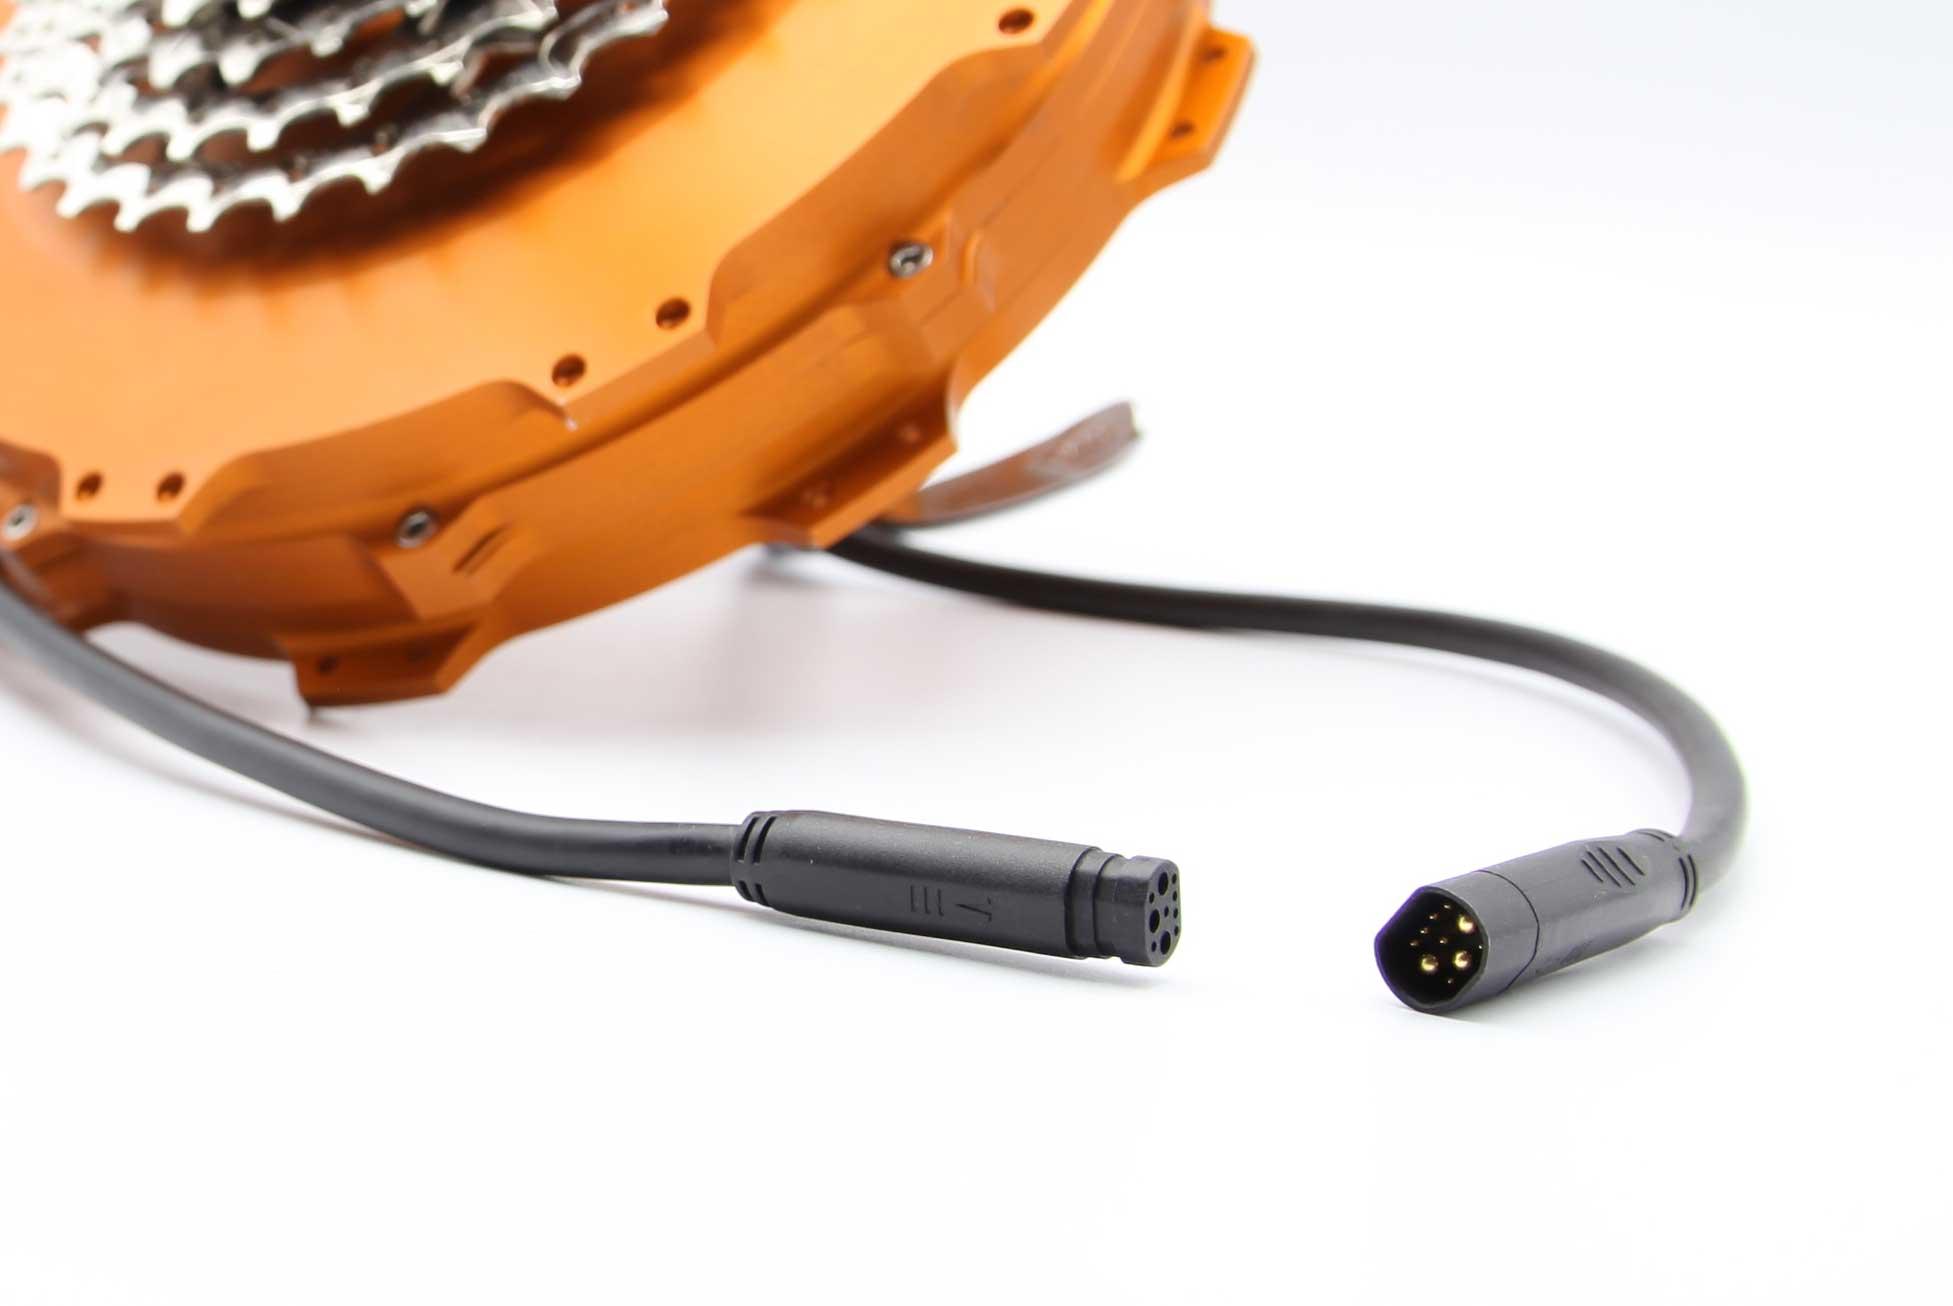 Sistema de montaje Plug & Play